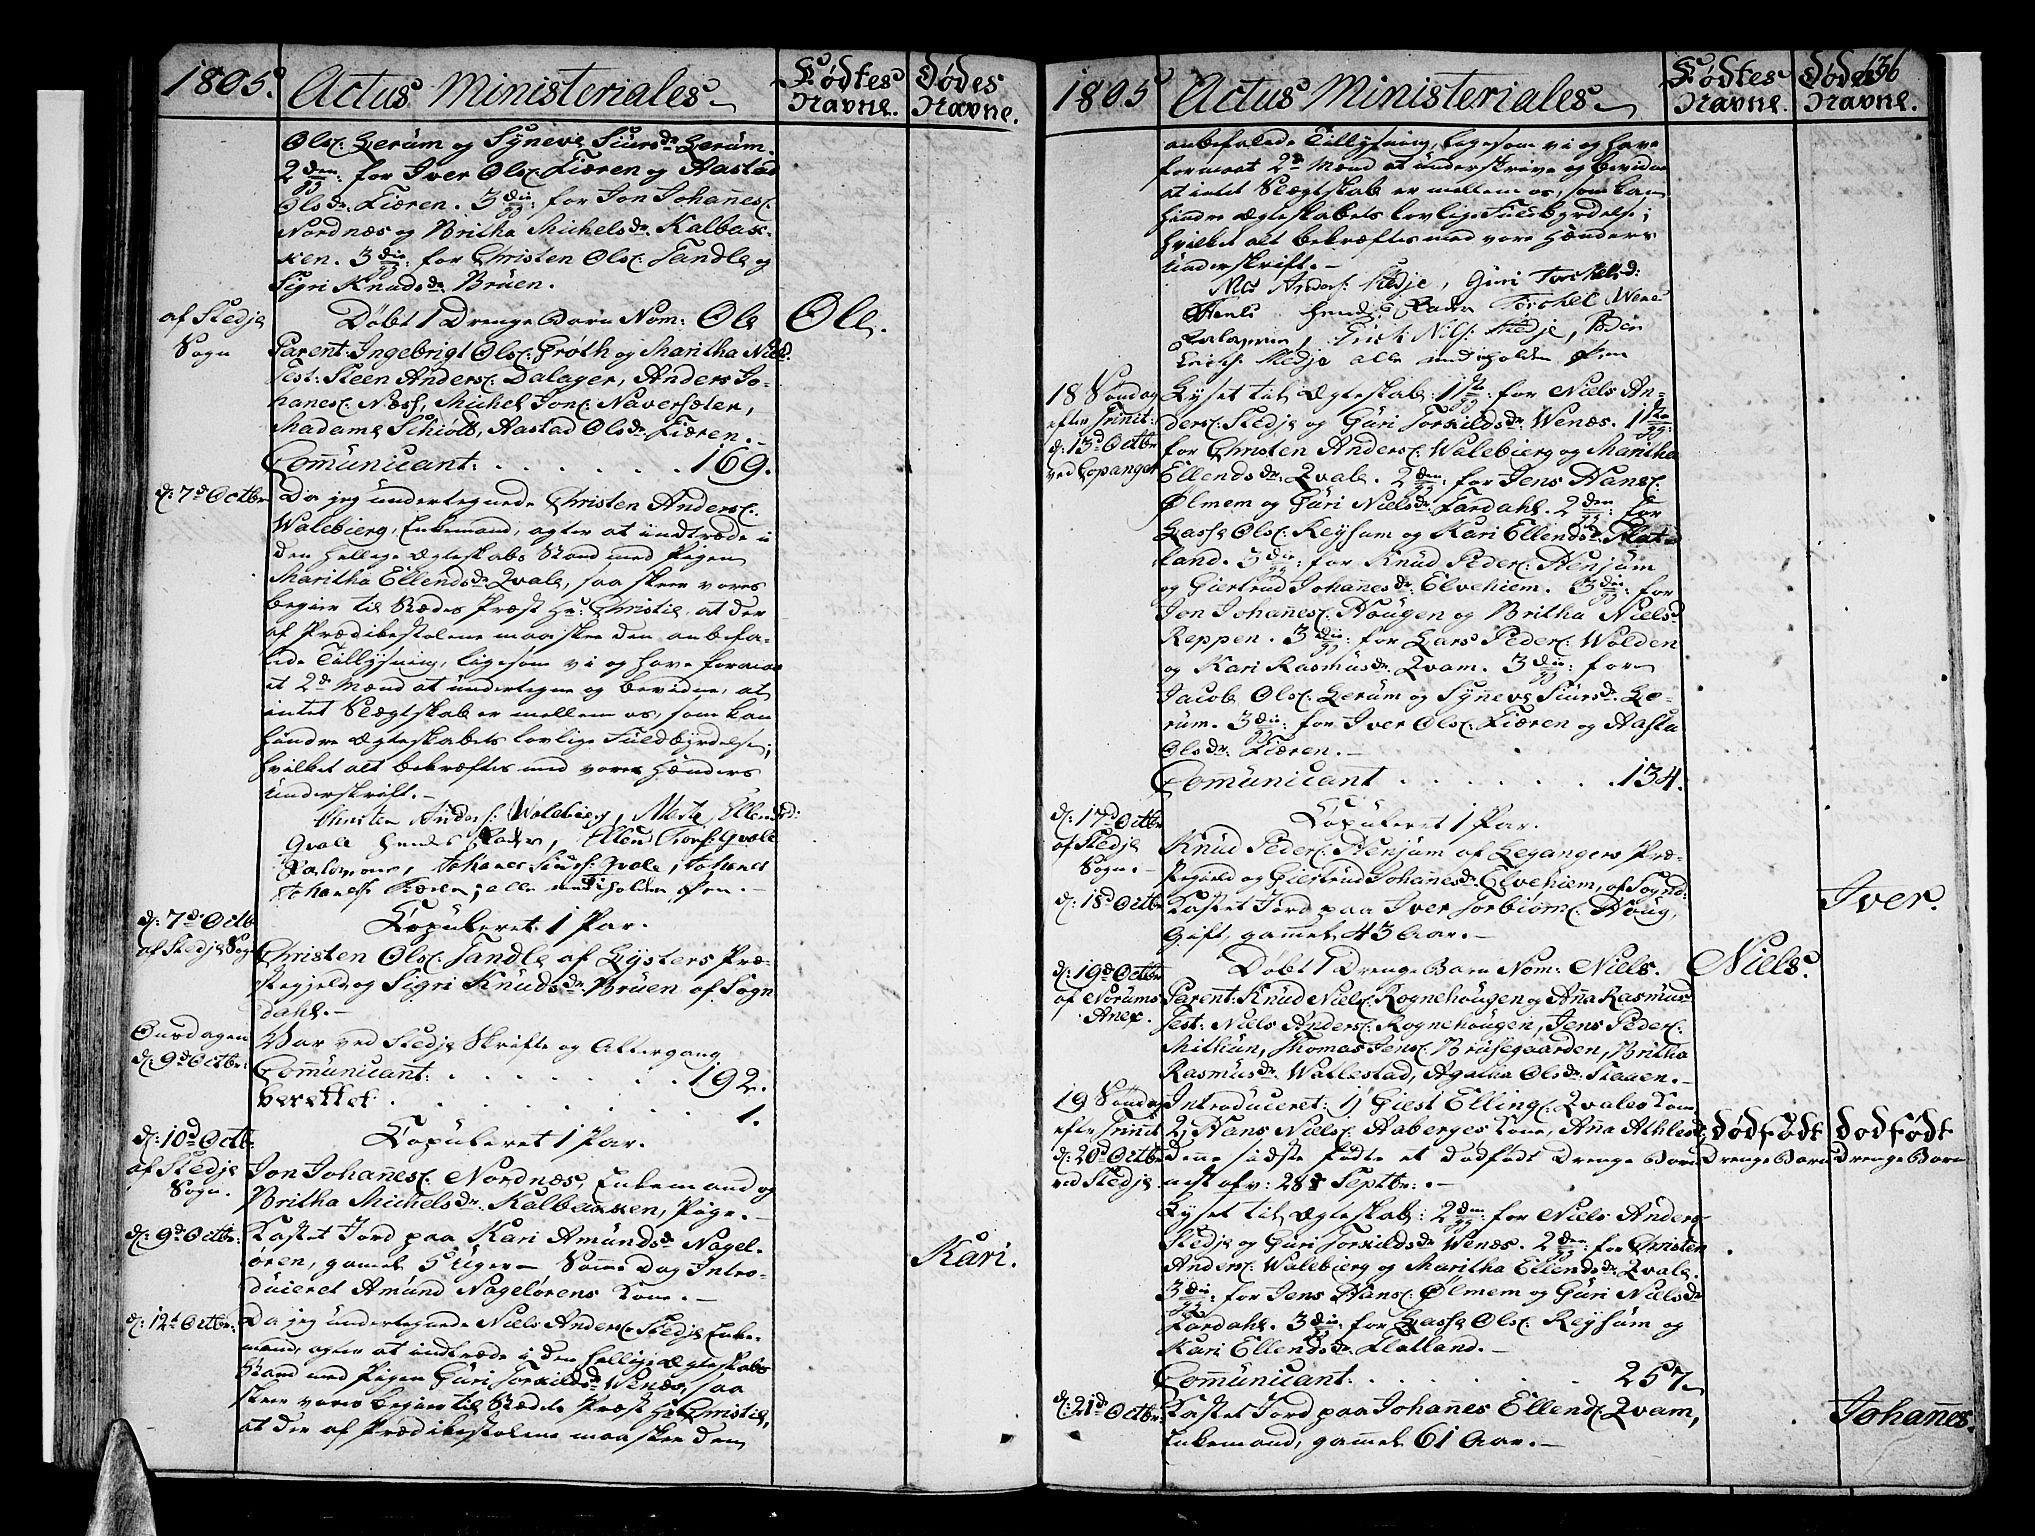 SAB, Sogndal sokneprestembete, H/Haa/Haaa/L0008: Ministerialbok nr. A 8, 1795-1809, s. 136